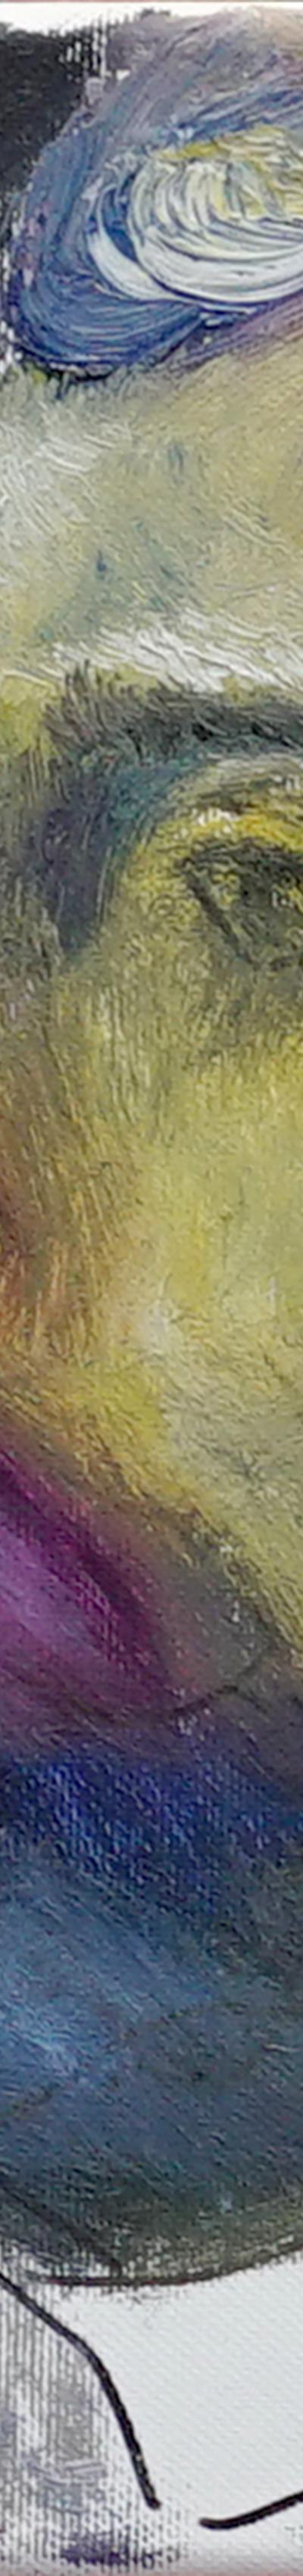 sakal 24x30 cm, oil on canvas